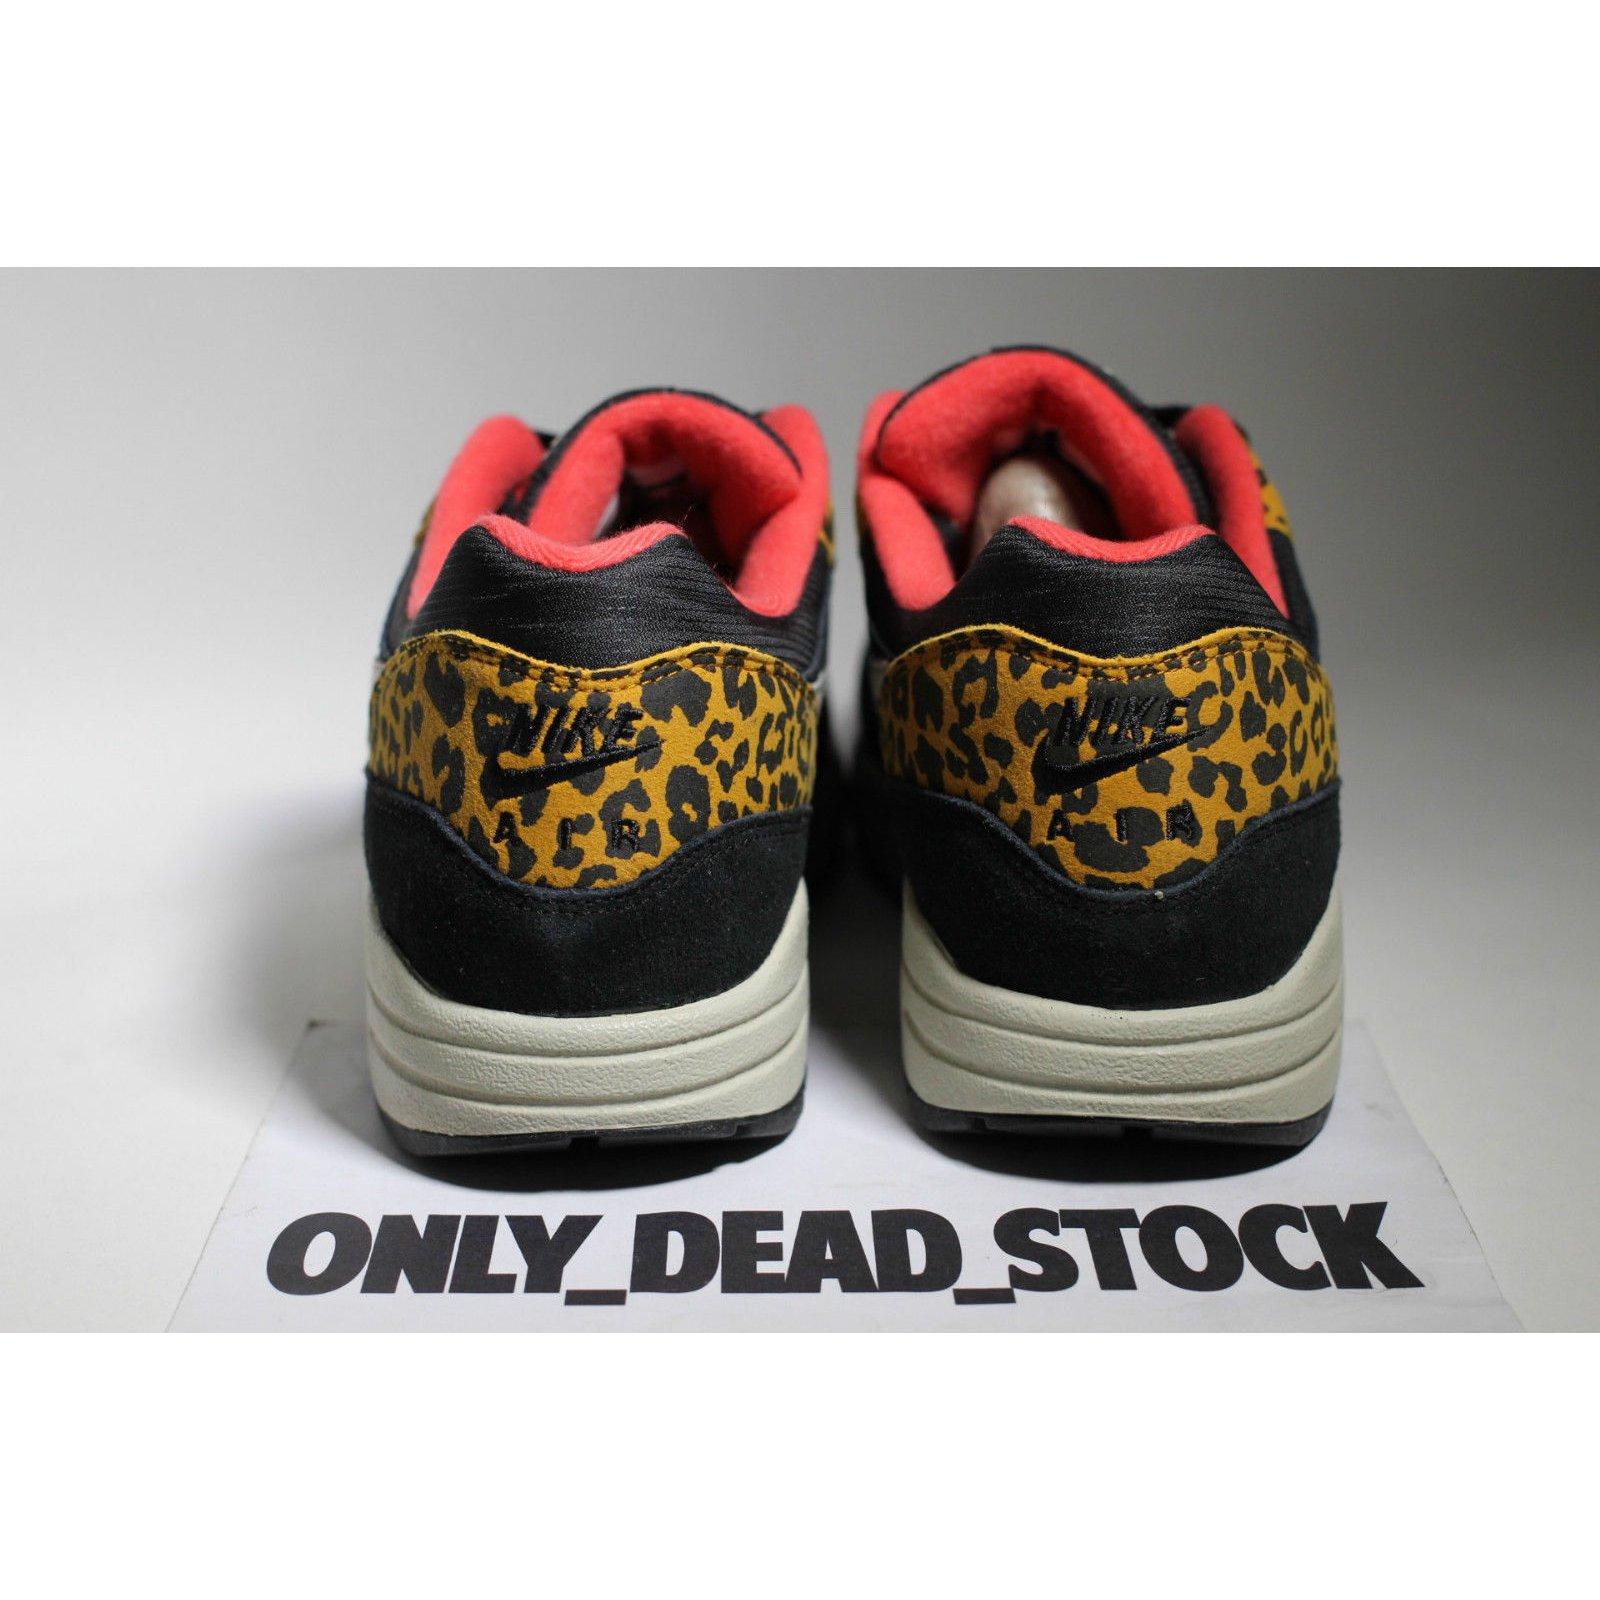 promo code f6f2c f474f Nike Sneakers Sneakers Suede Leopard print ref.14746 - Joli Closet